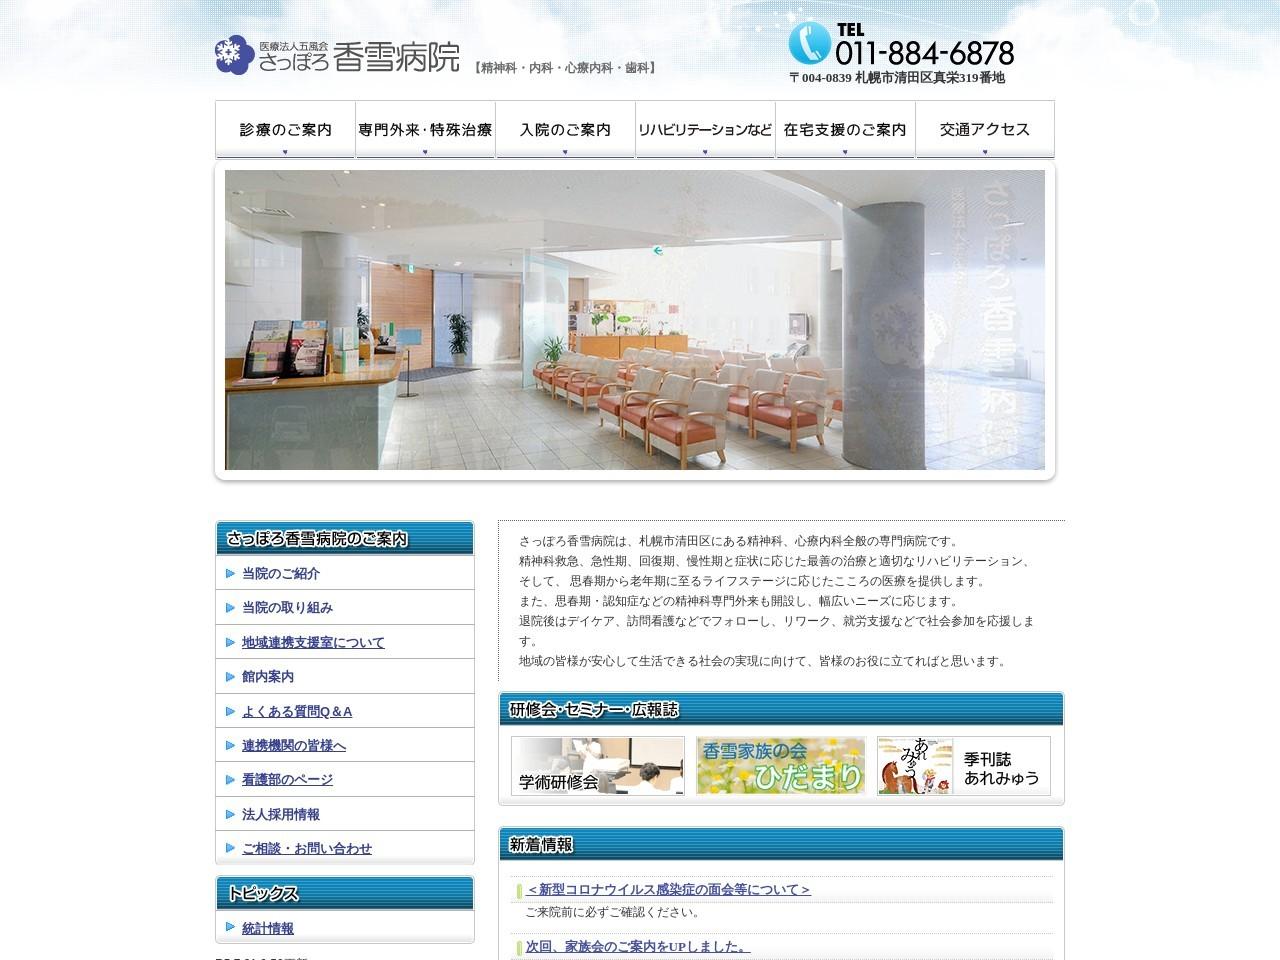 医療法人社団五風会  さっぽろ香雪病院 (北海道札幌市清田区)